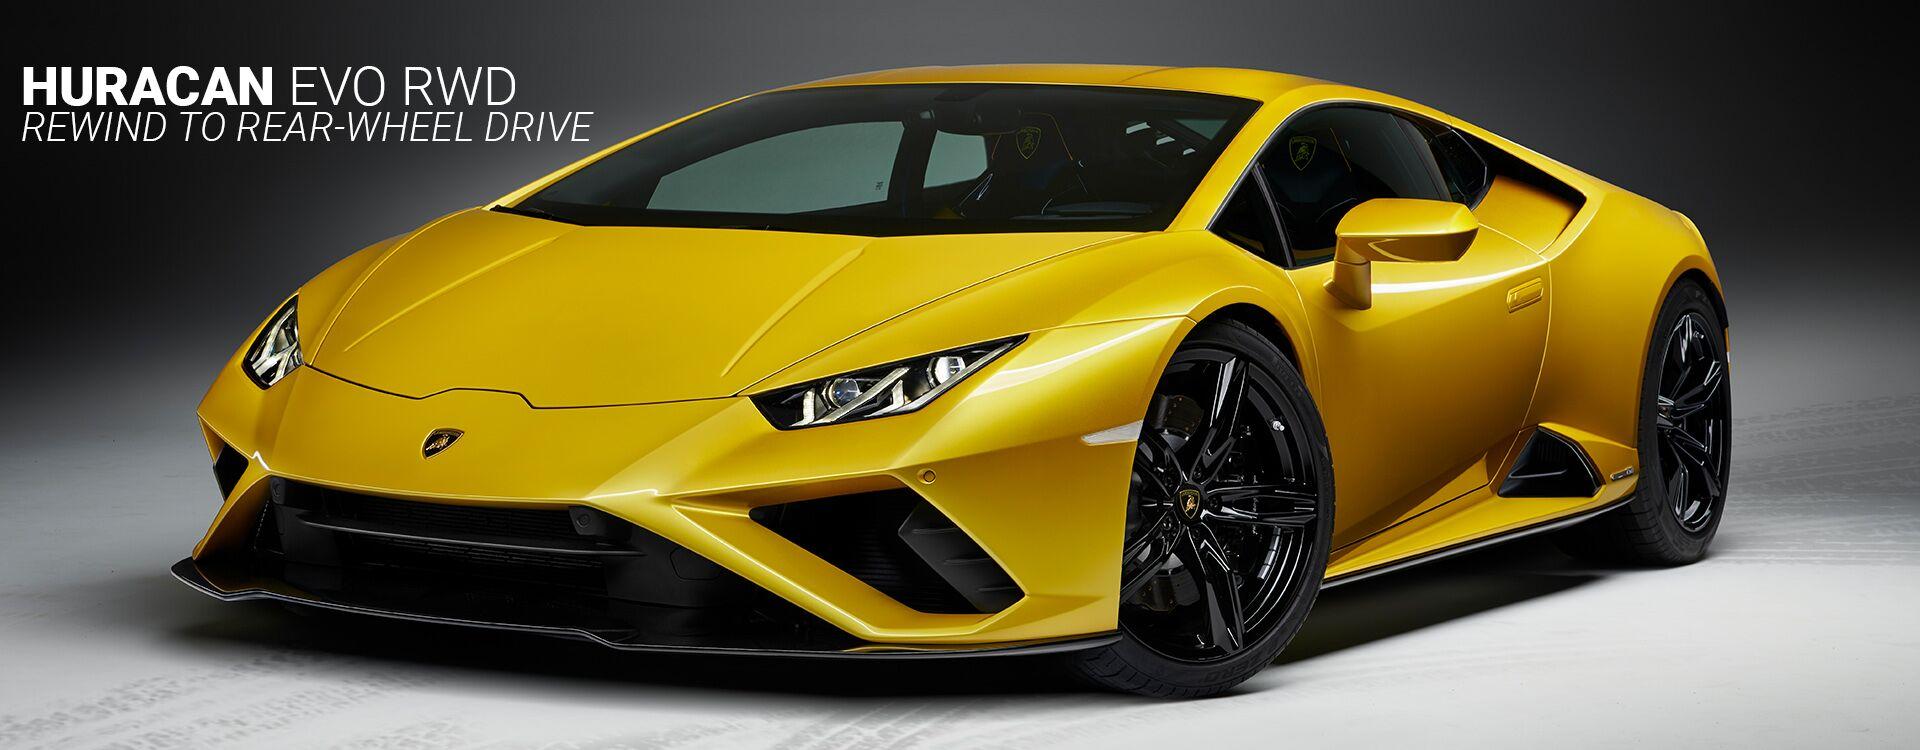 Lamborghini Dealership West Palm Beach Fl Used Cars